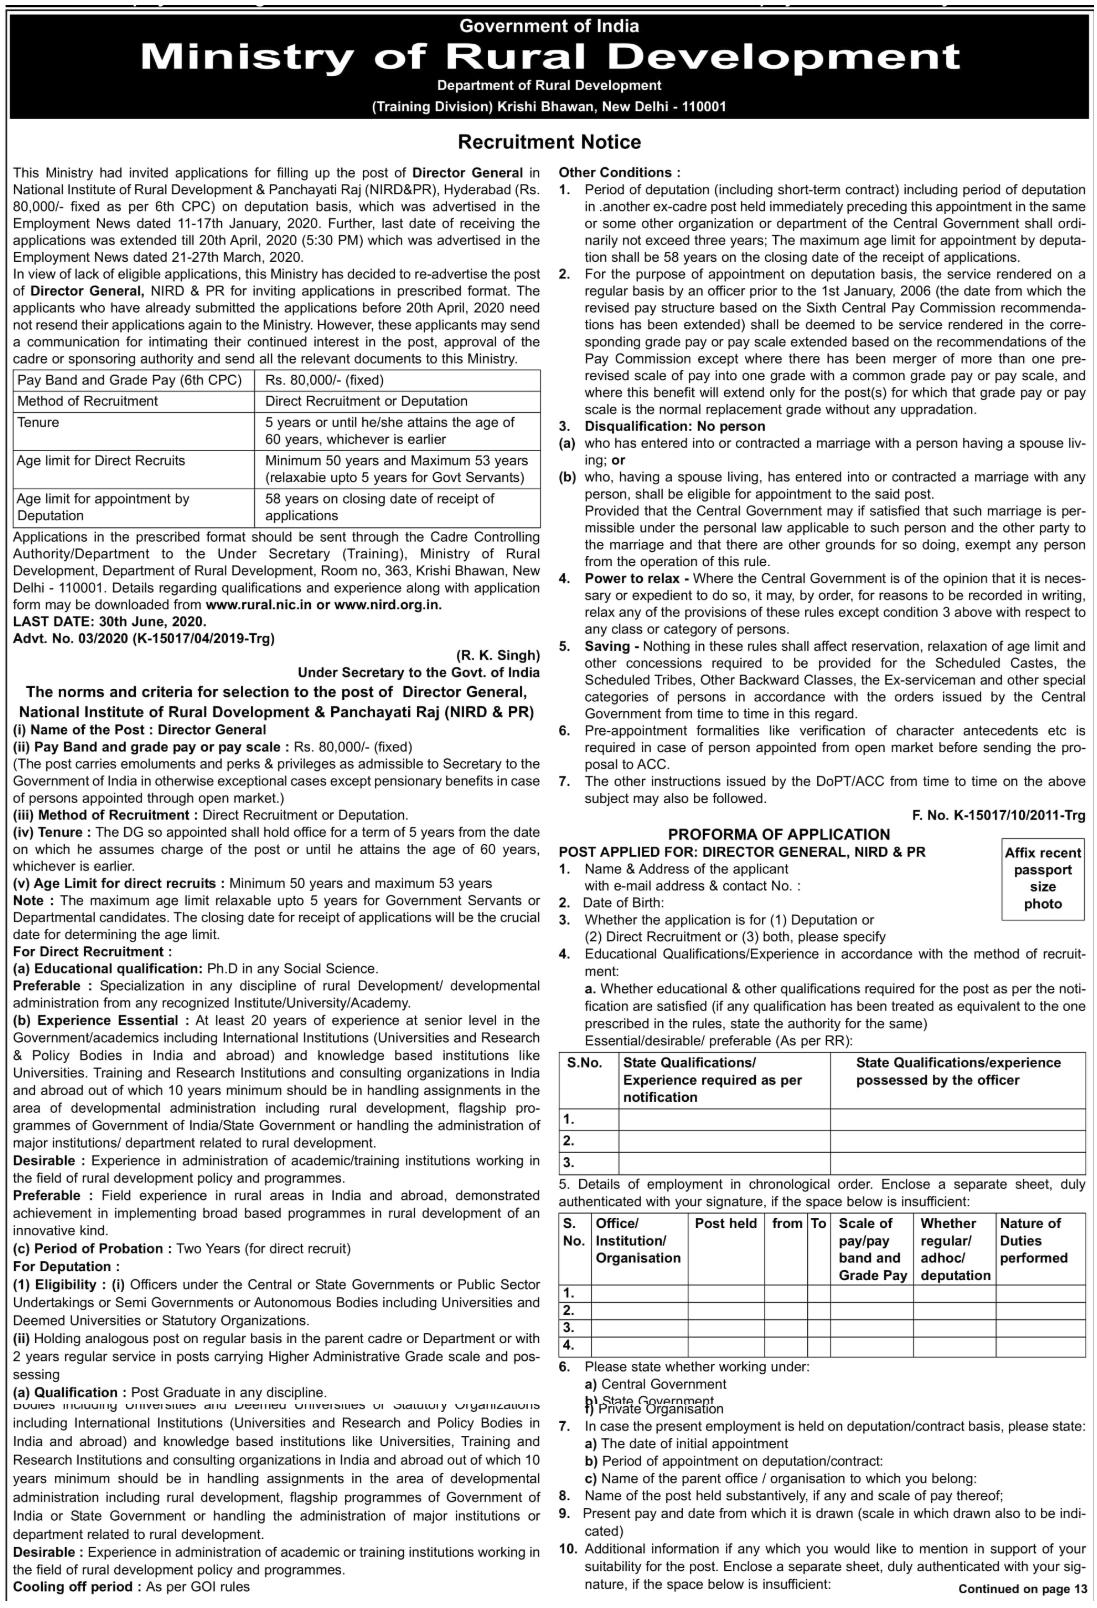 ministry-of-rural-development-recruitment-2